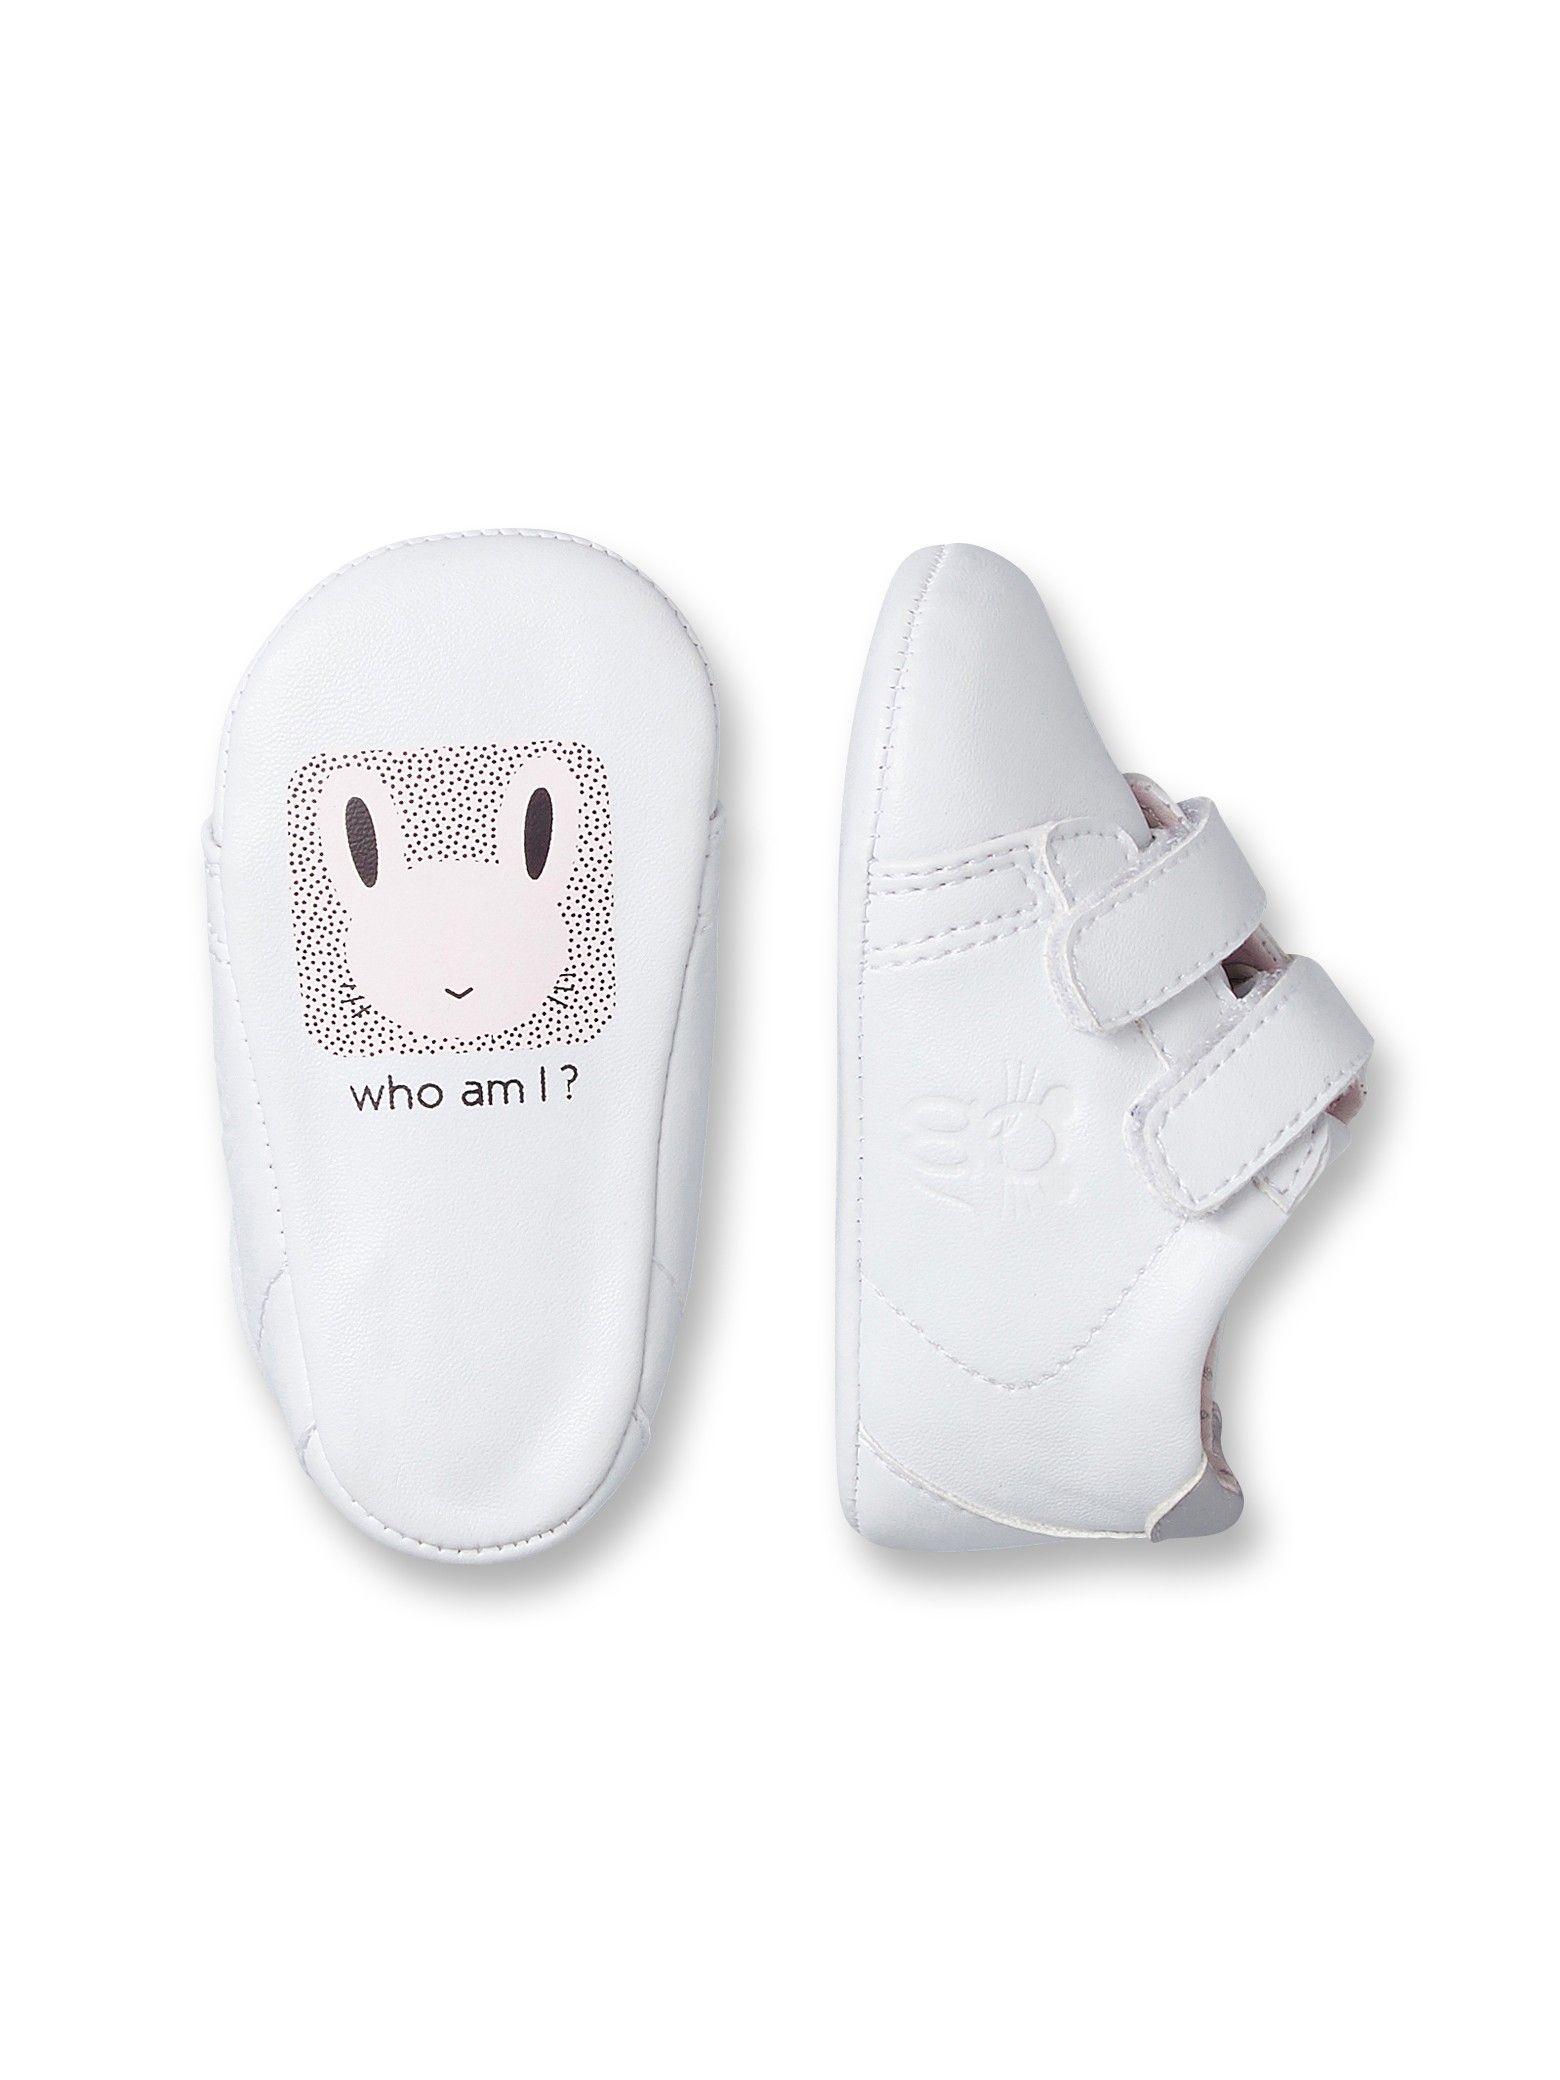 b92847c32cf9b Tennis à scratchs bébé - Blanc - Chaussures - Obaïbi   Okaïdi ...